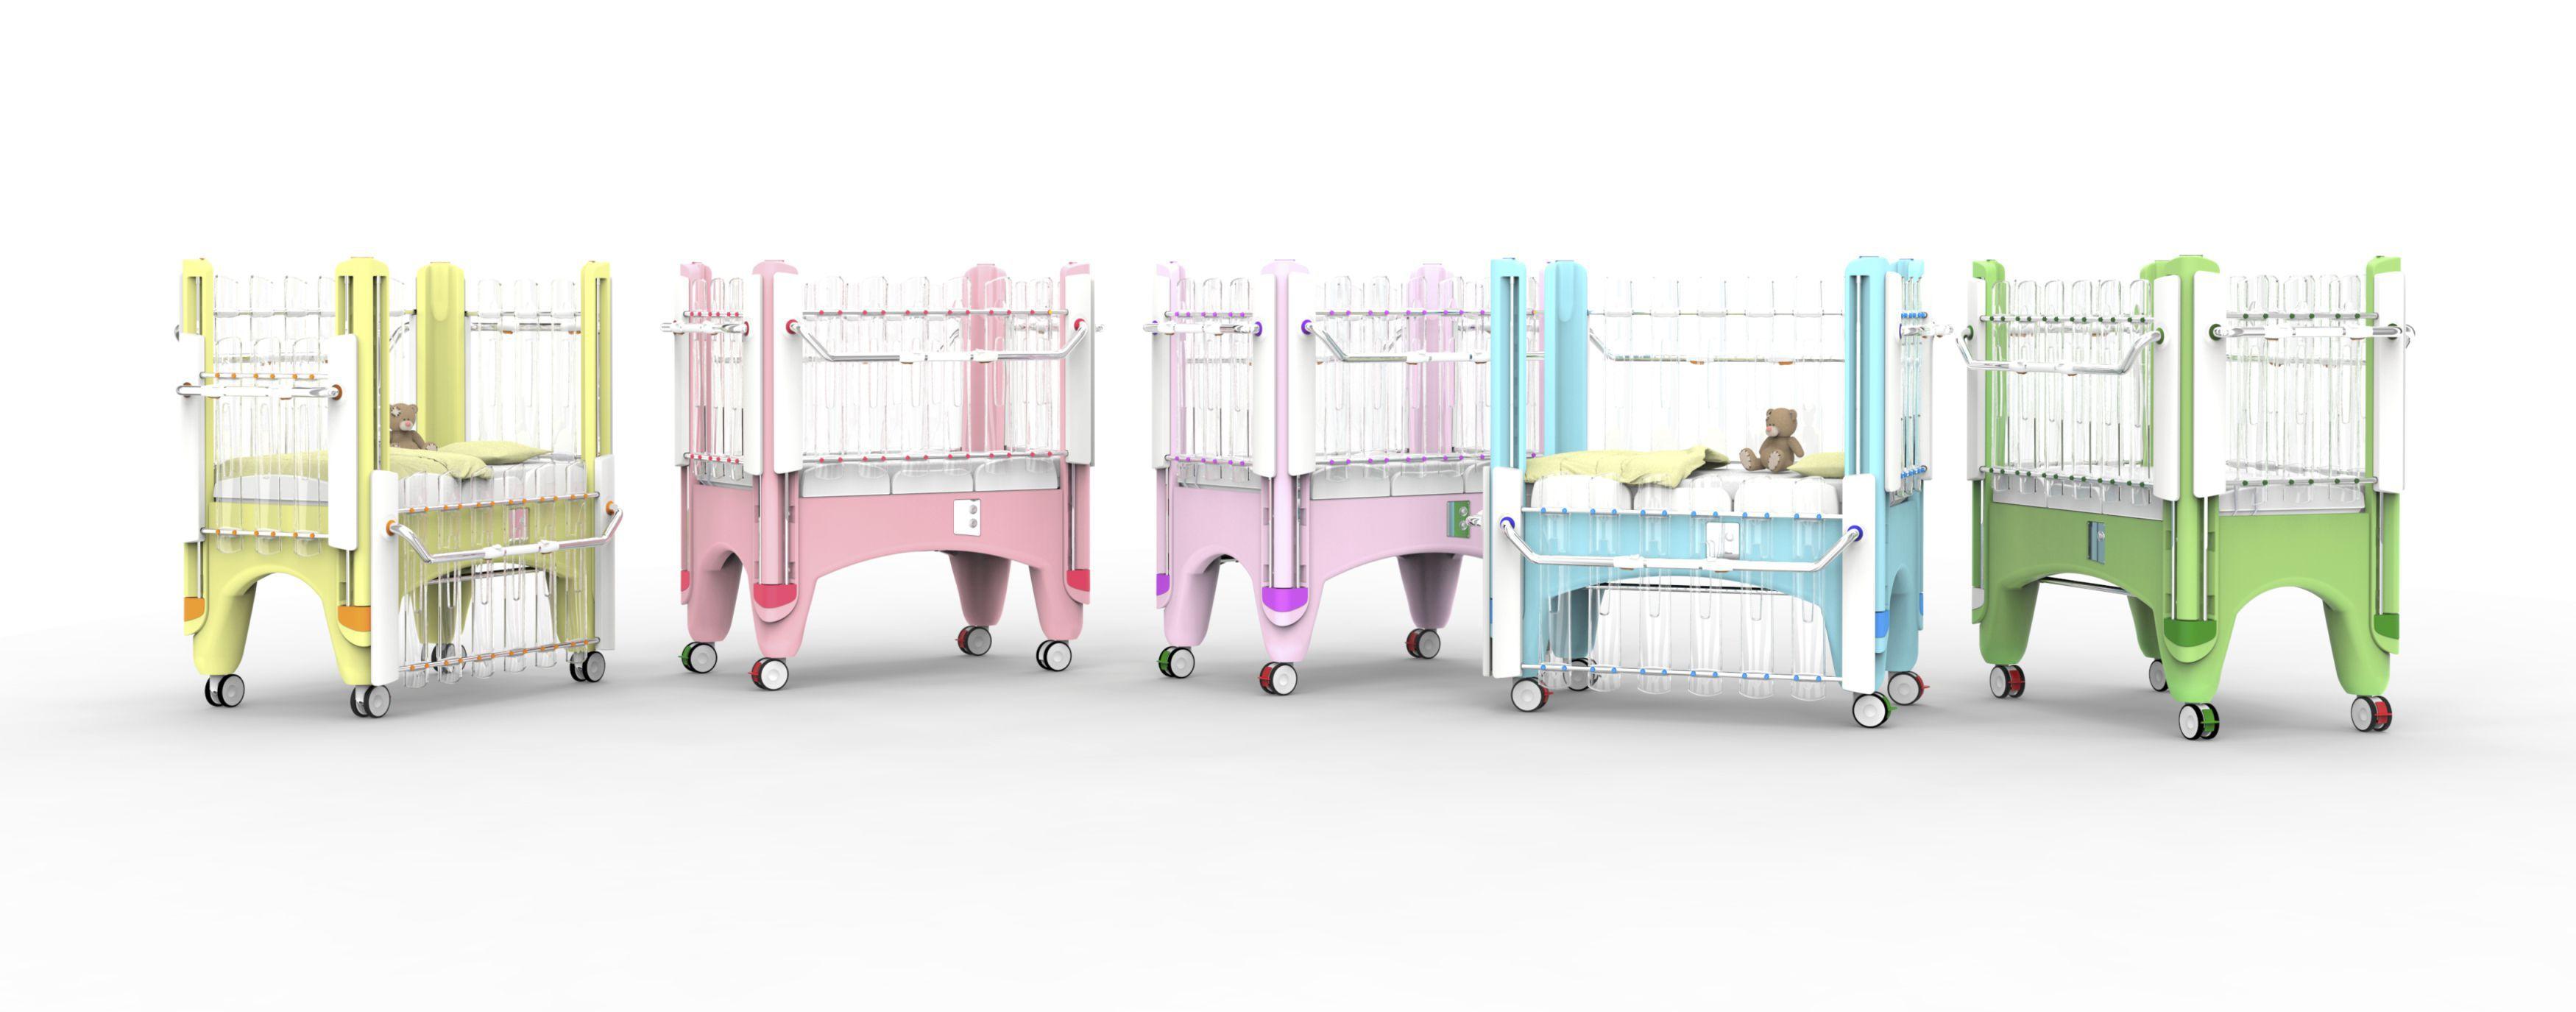 symba cama hospitalaria pediátrica eléctrica 3 - Costa Rica